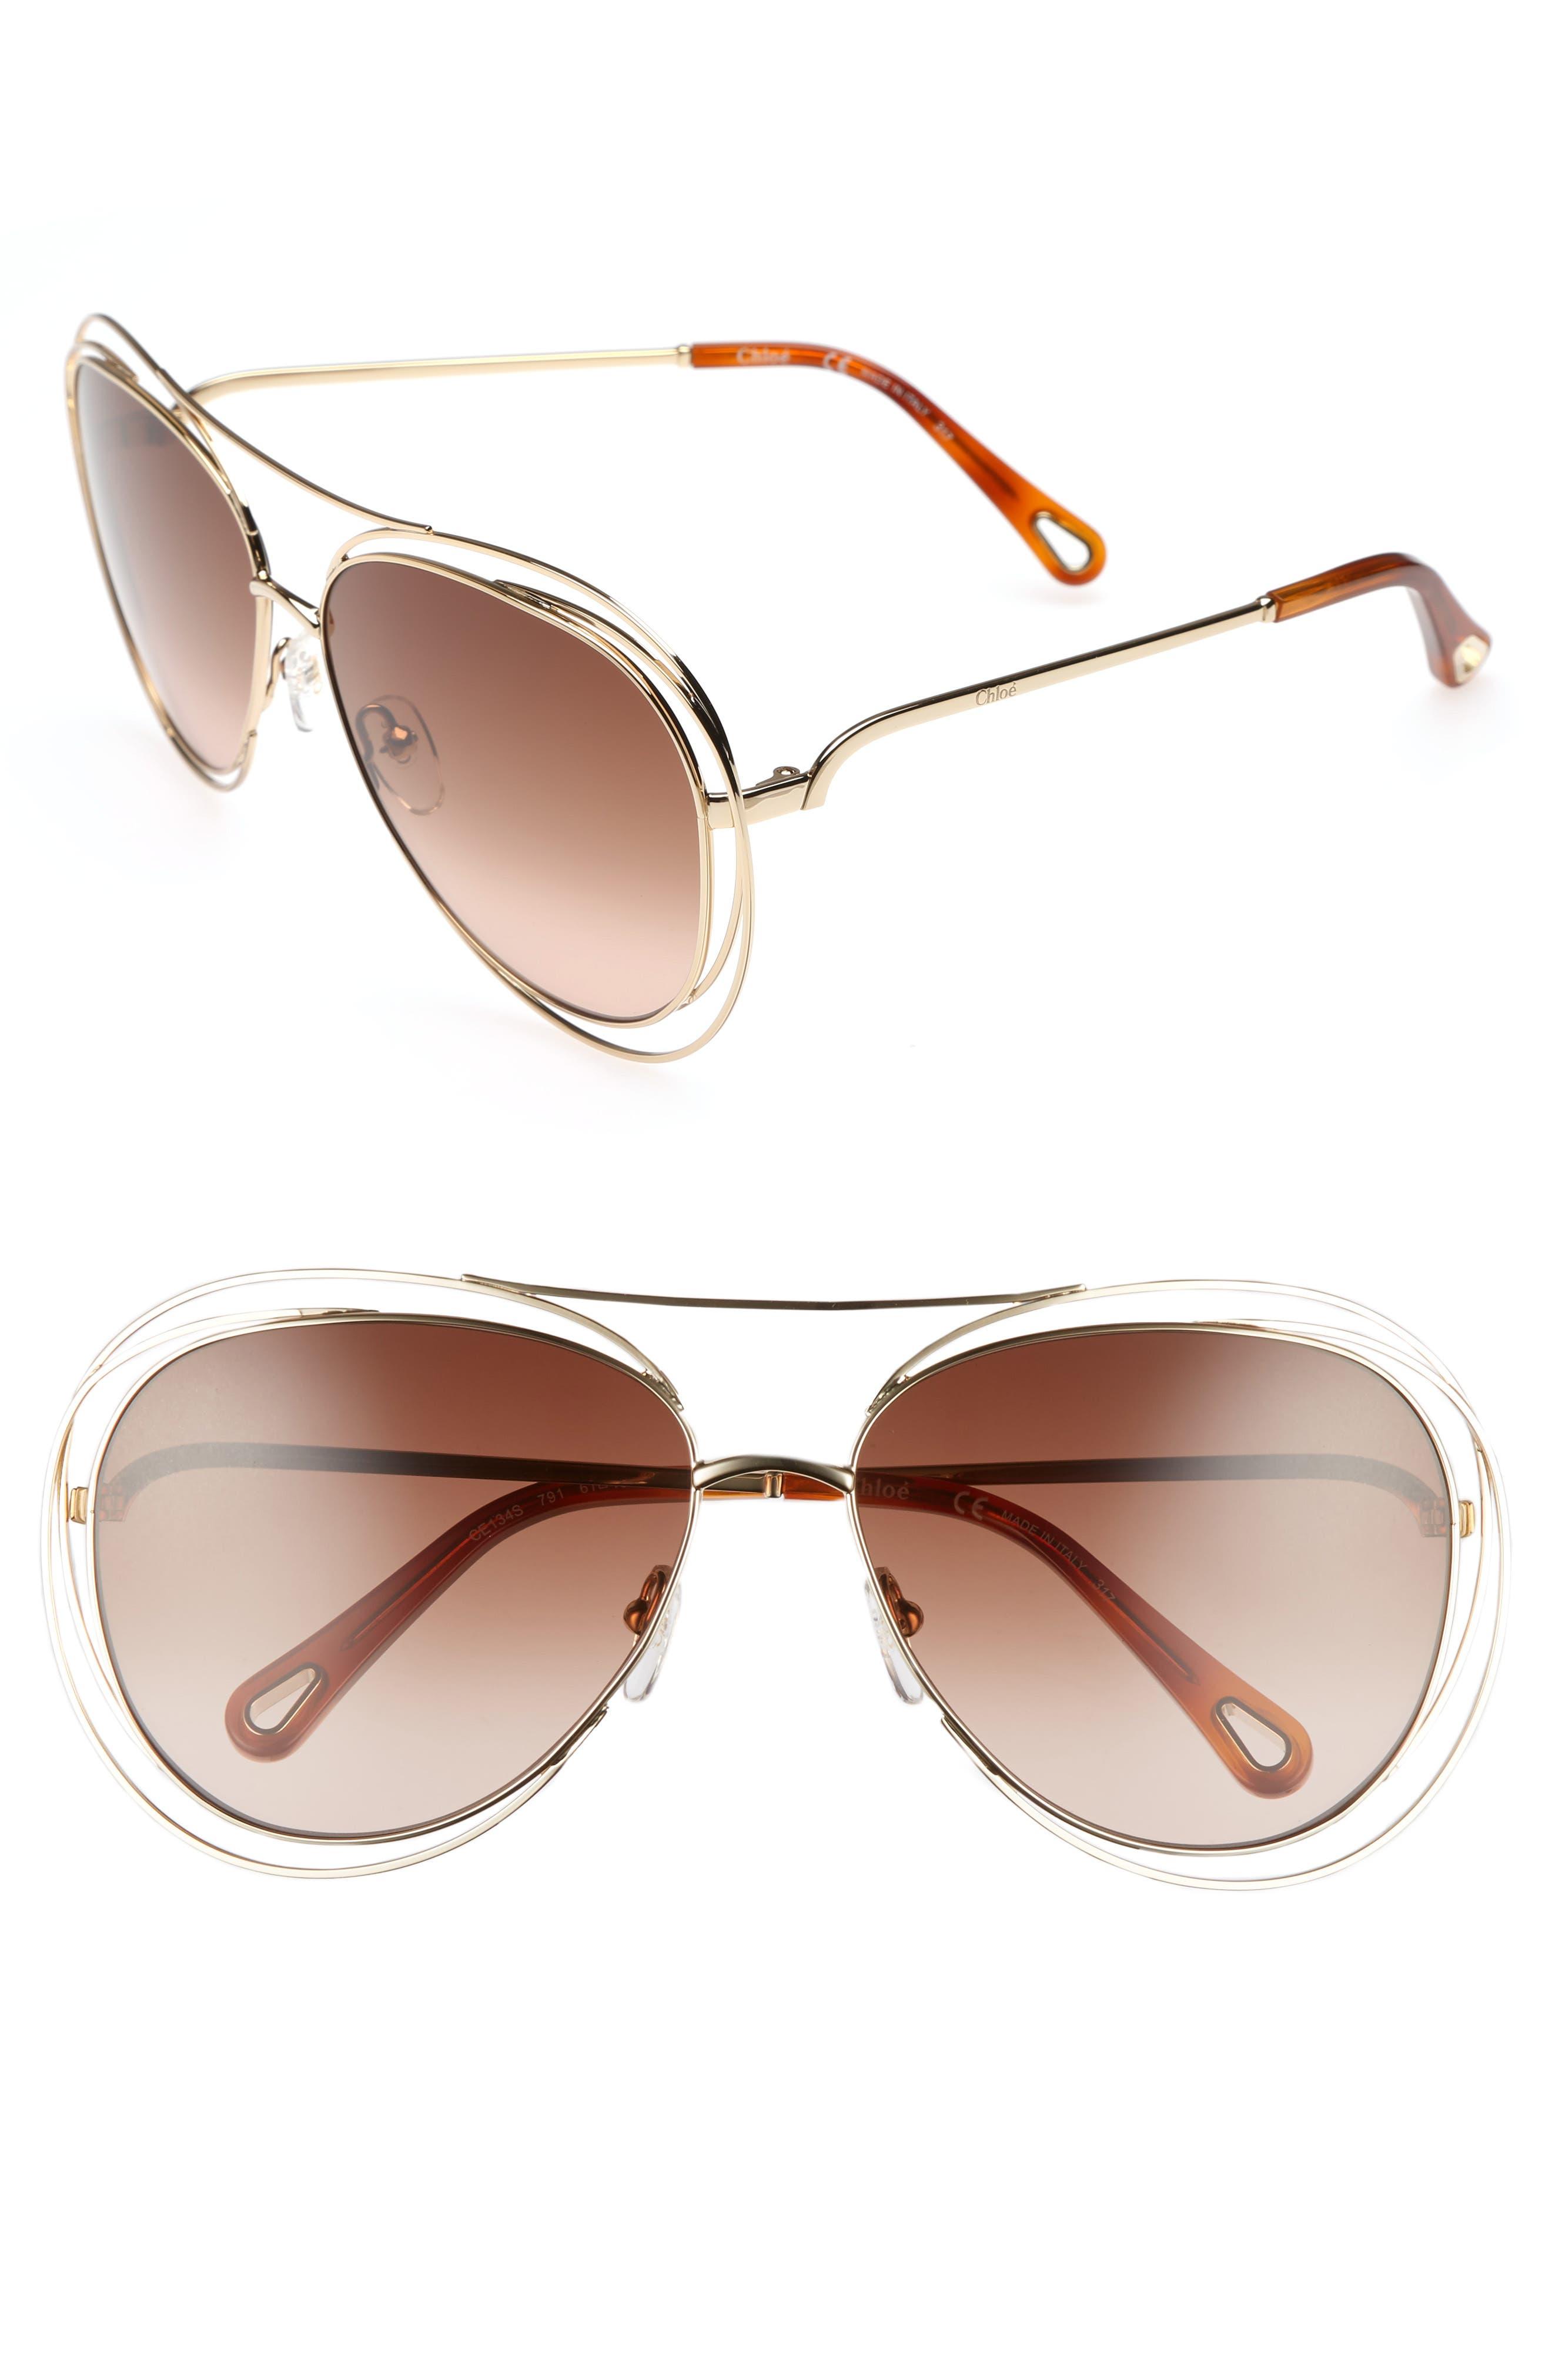 61mm Aviator Sunglasses,                         Main,                         color, Gold/ Havana